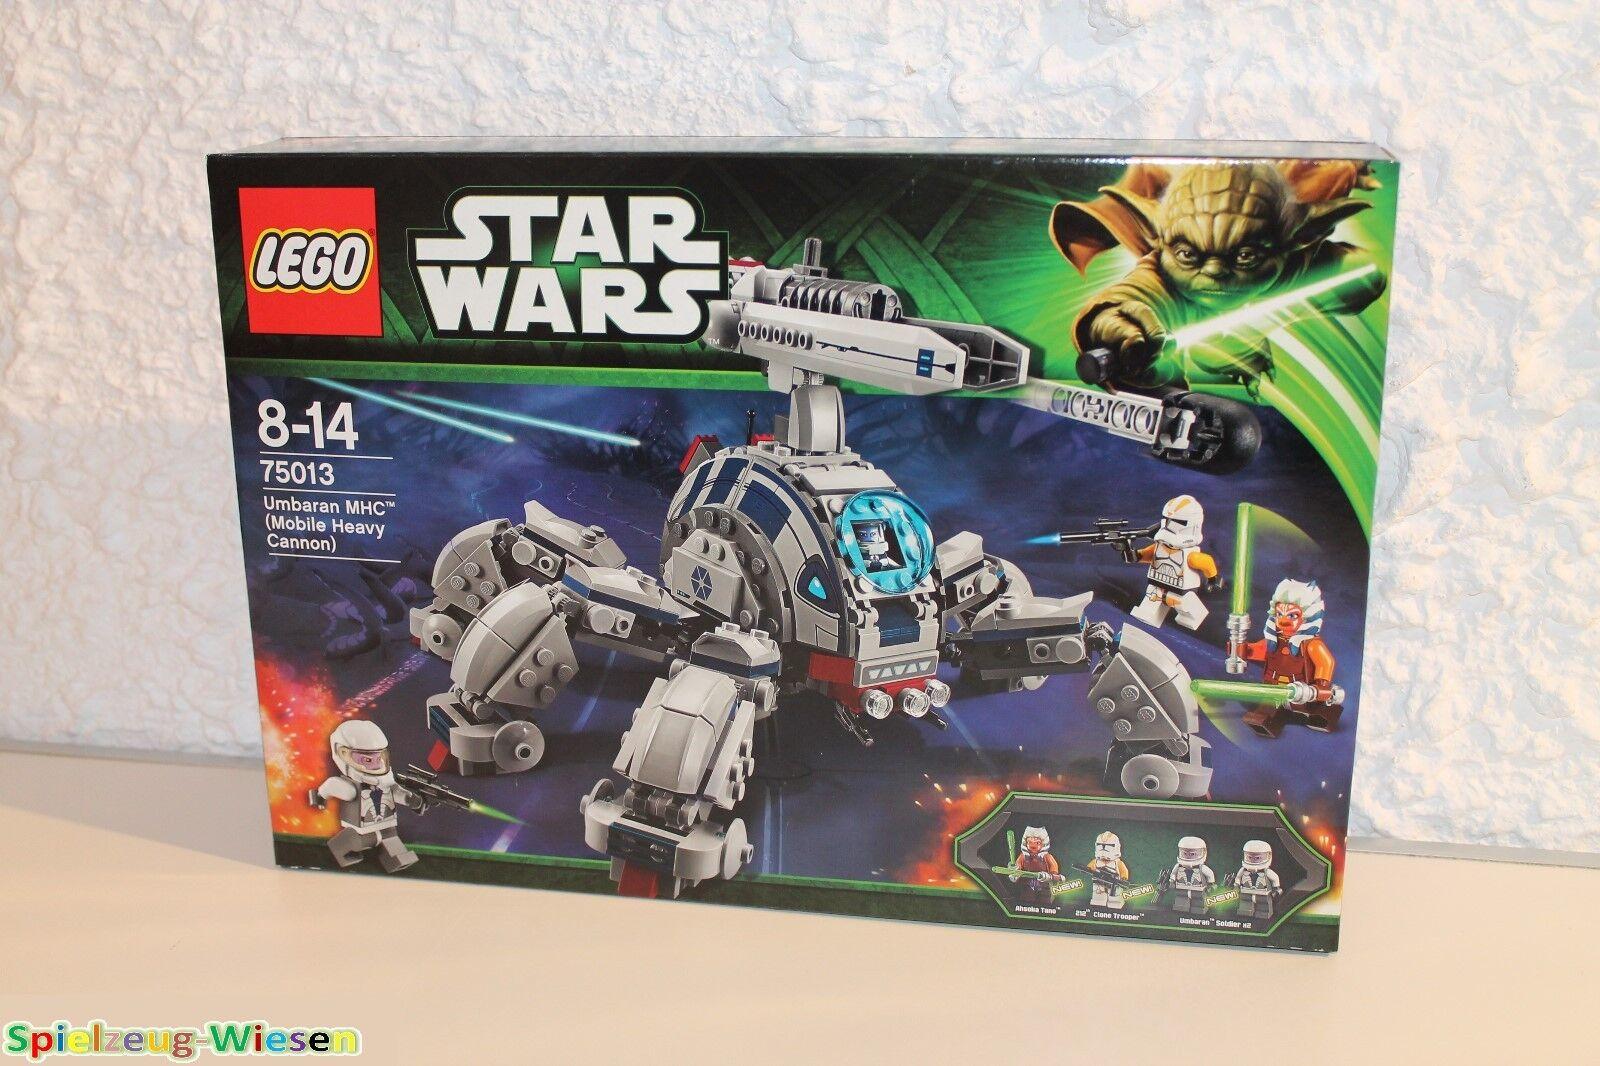 LEGO ® Star Wars ™ 75013 umbarran MHC ™ - NUOVO & OVP -